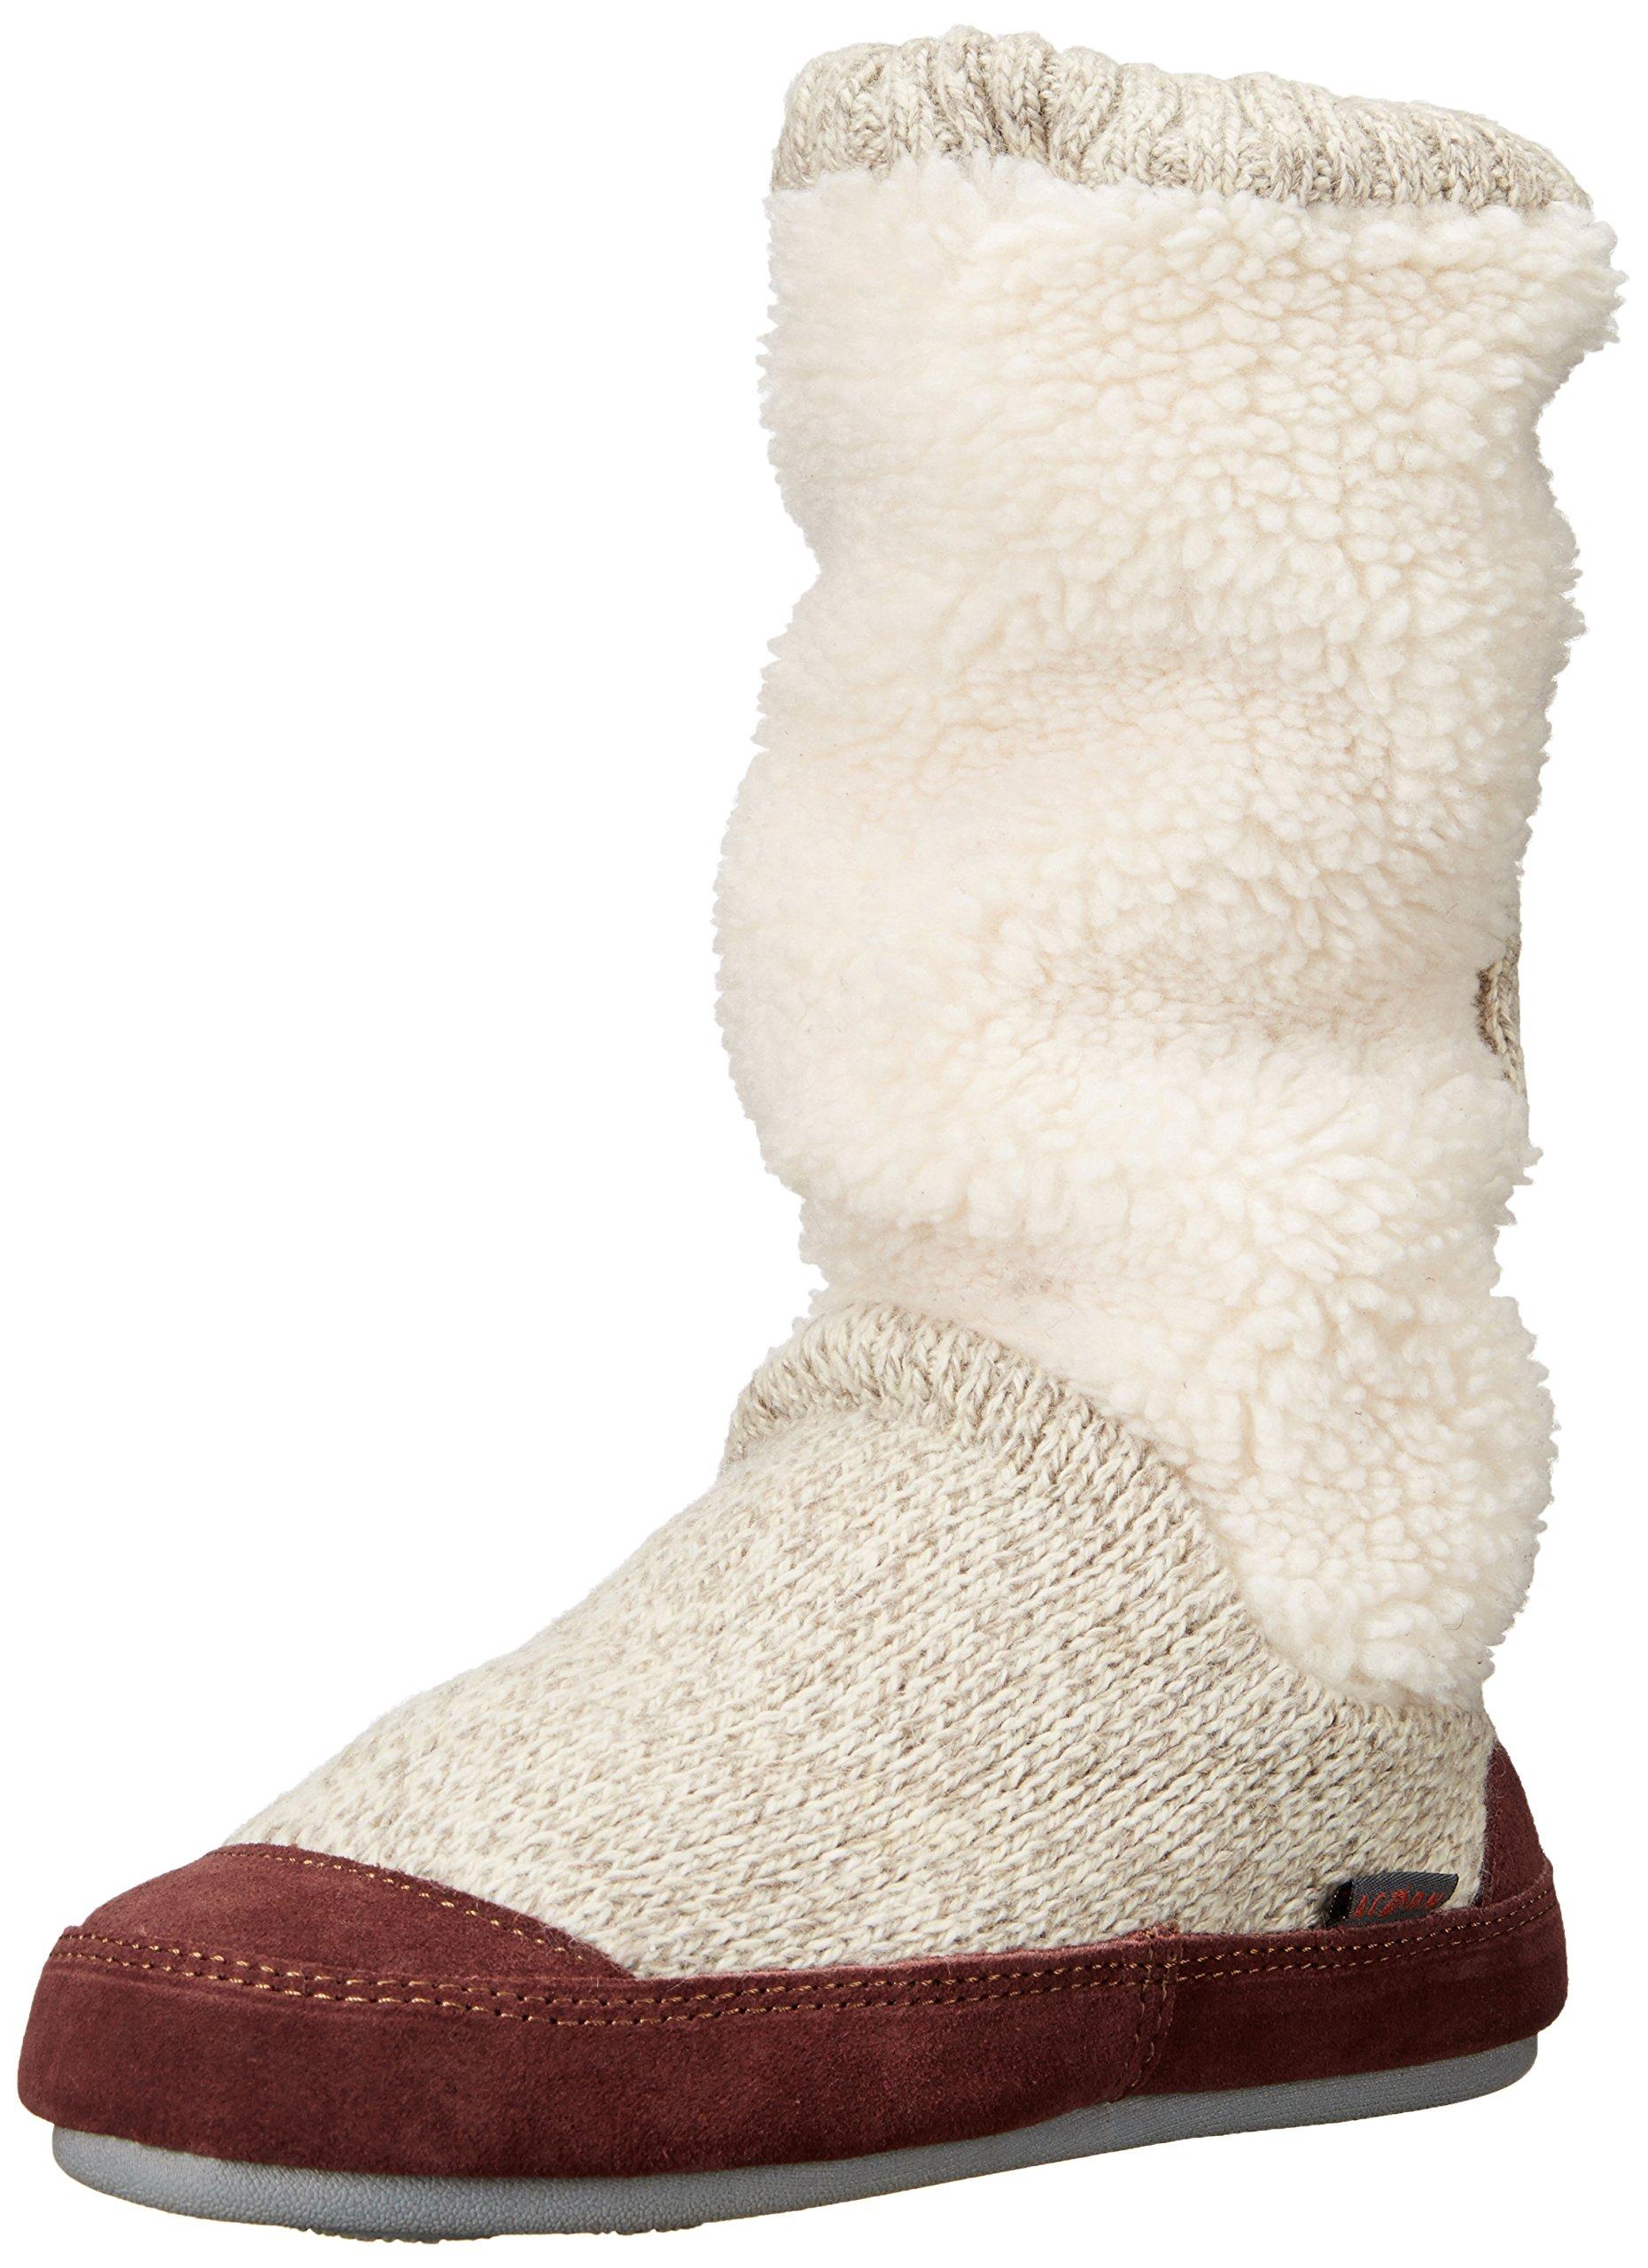 Acorn Women's Slouch Boots, Buff Popcorn, X-Large/9.5-10.5 B(M) US